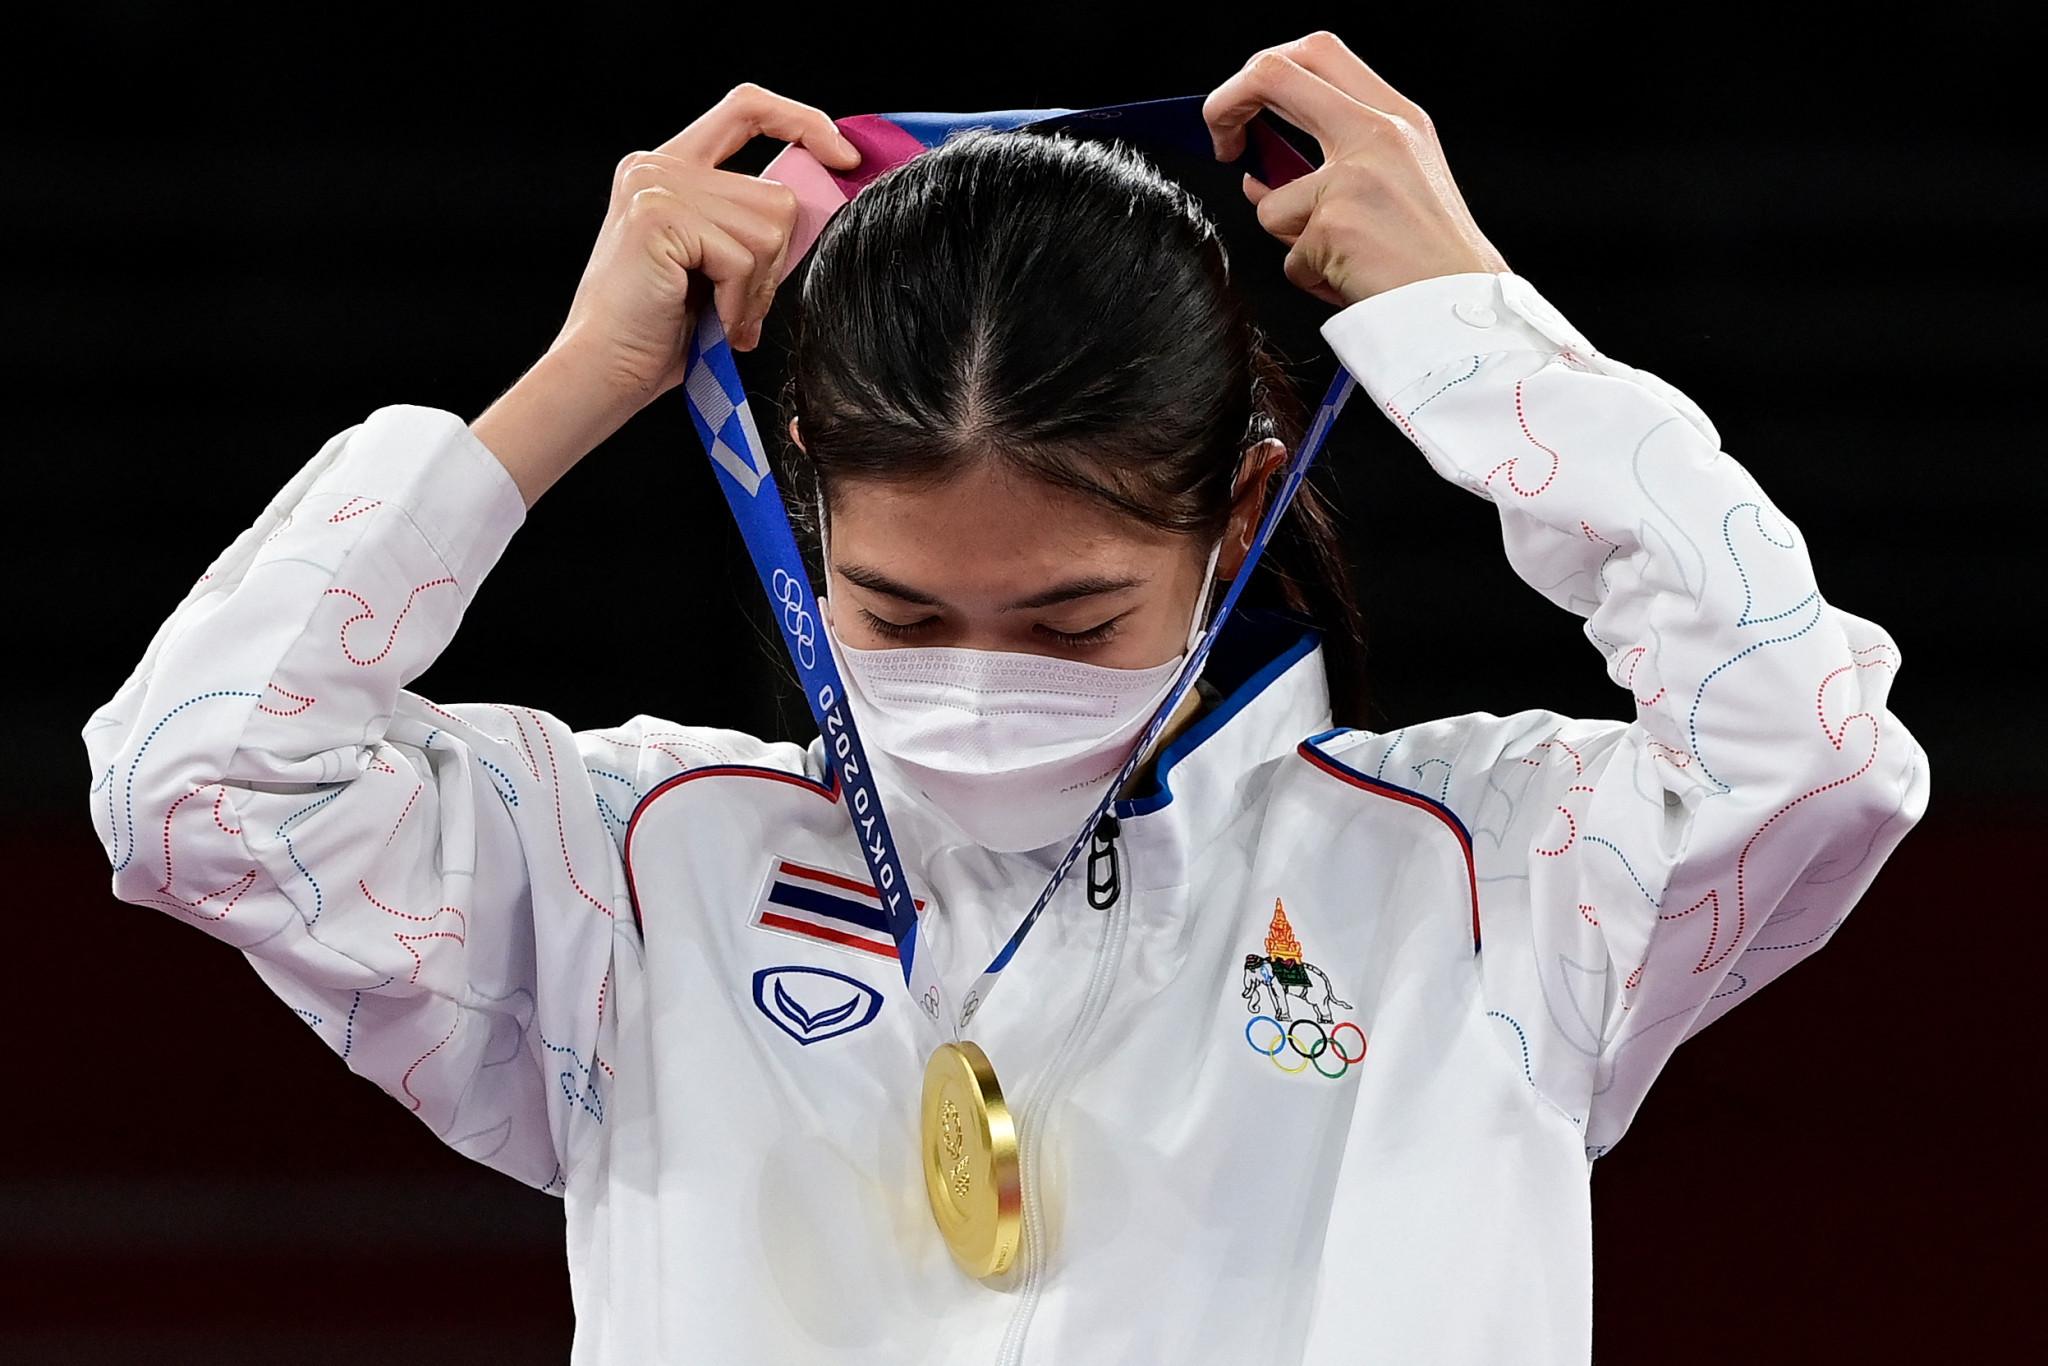 Wongpattanakit wins last gasp taekwondo gold at Tokyo 2020